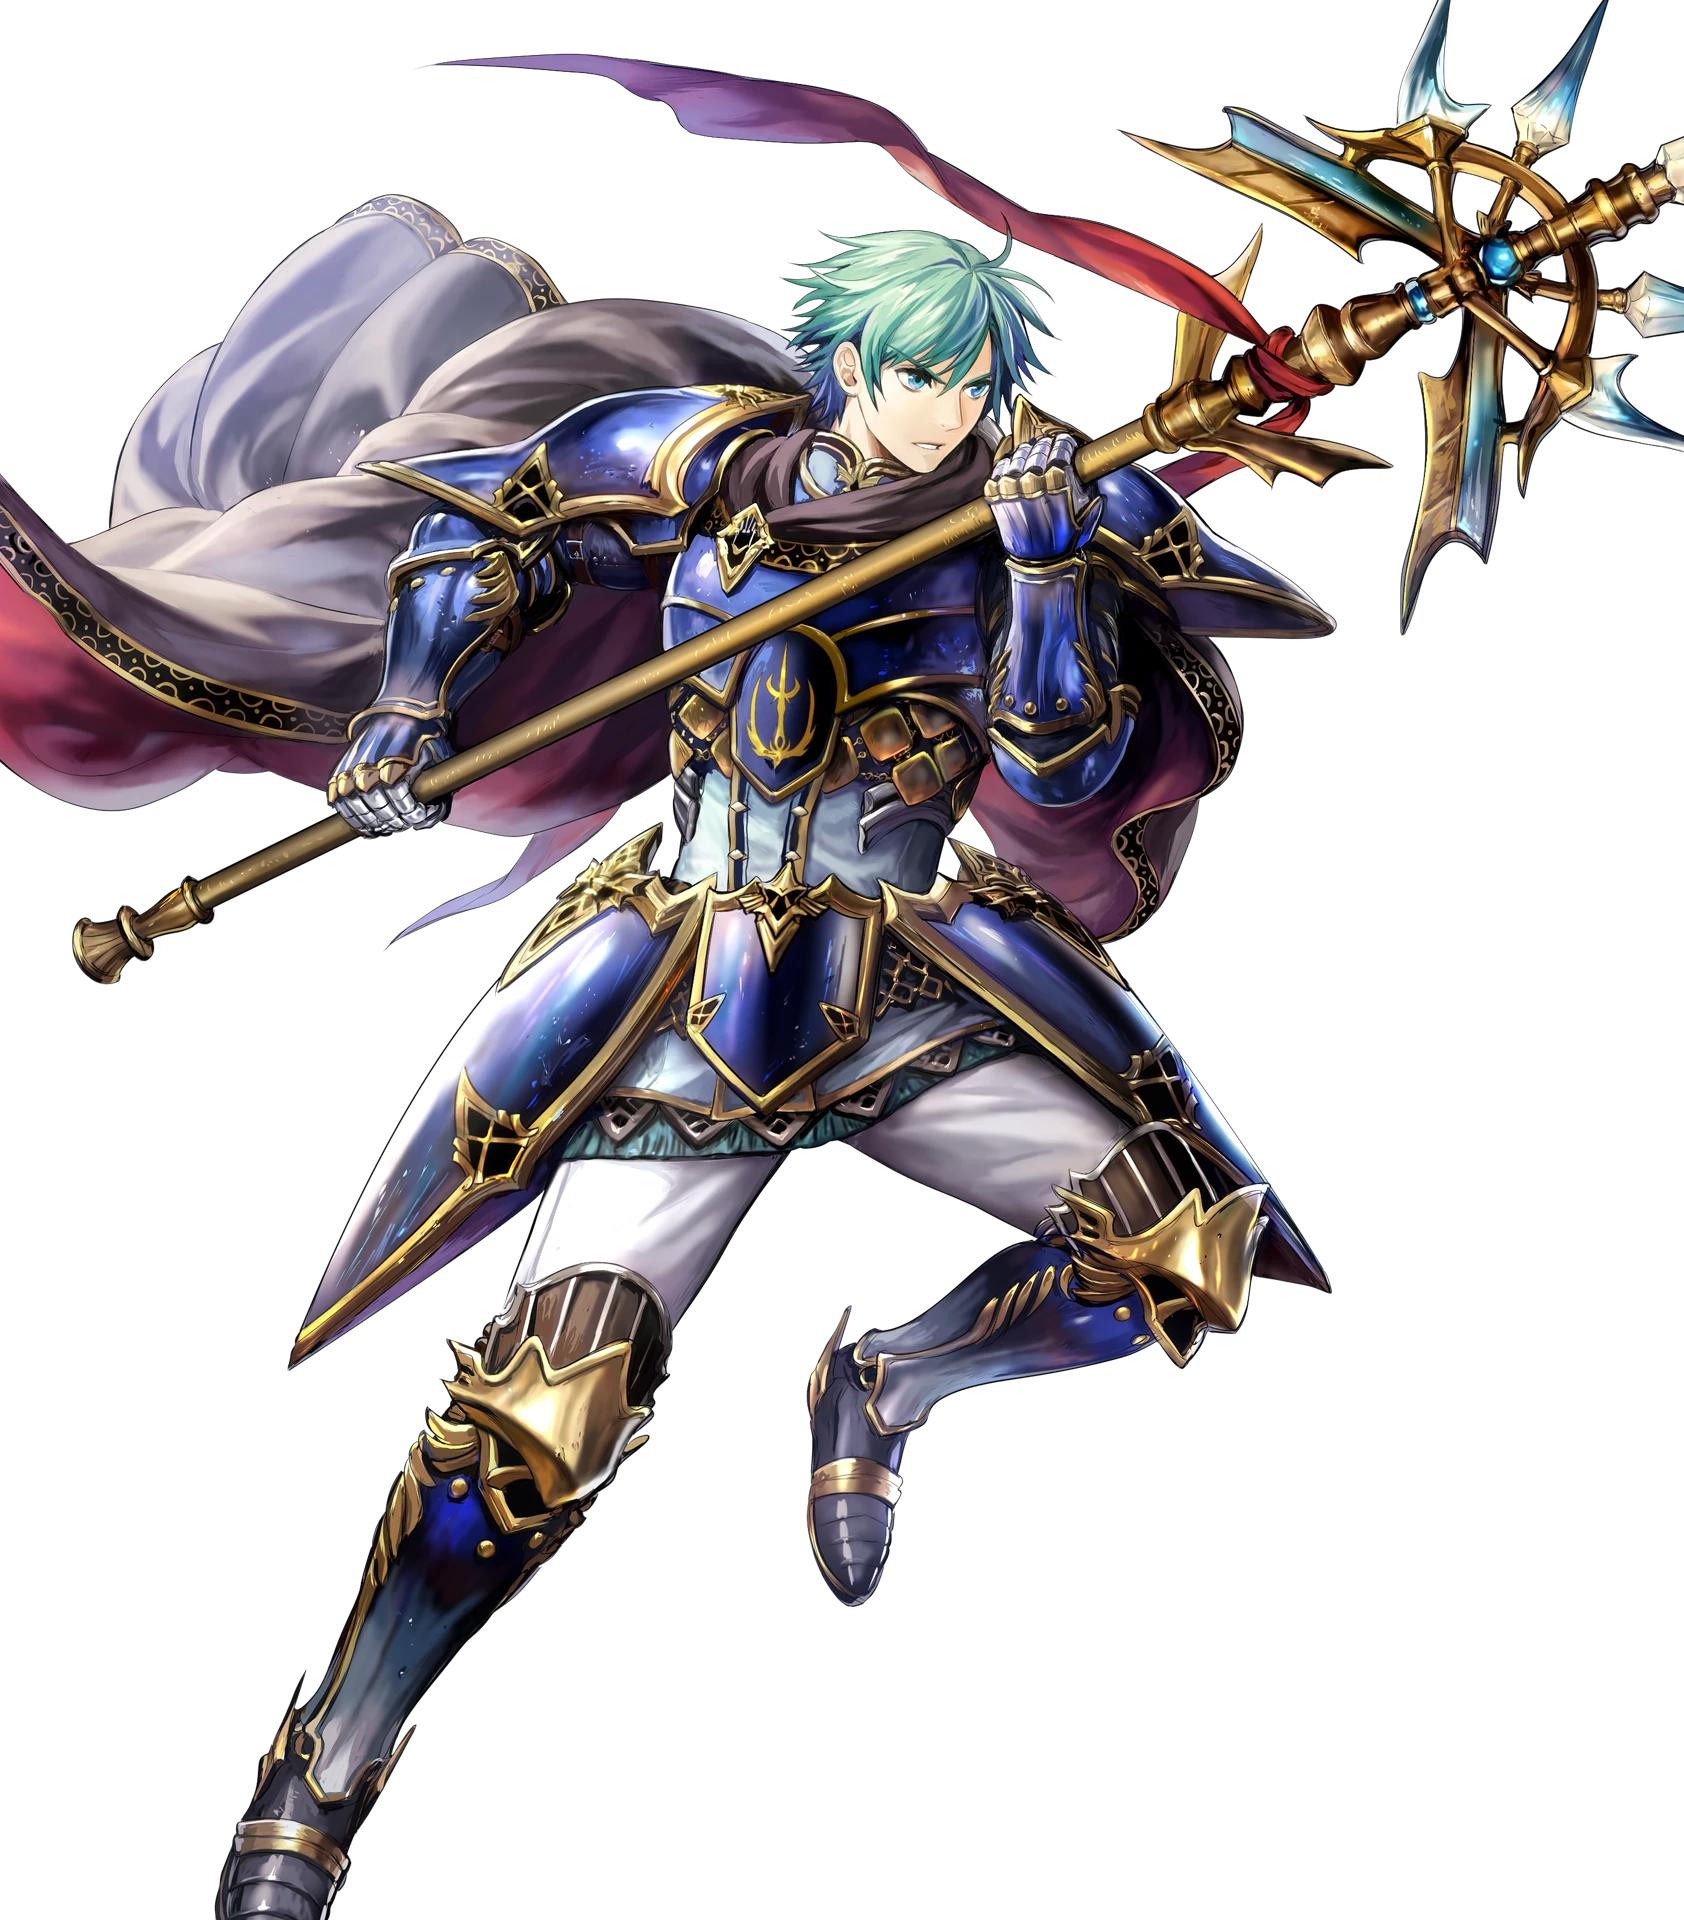 ephraim fire emblem fire emblem seima no kouseki image